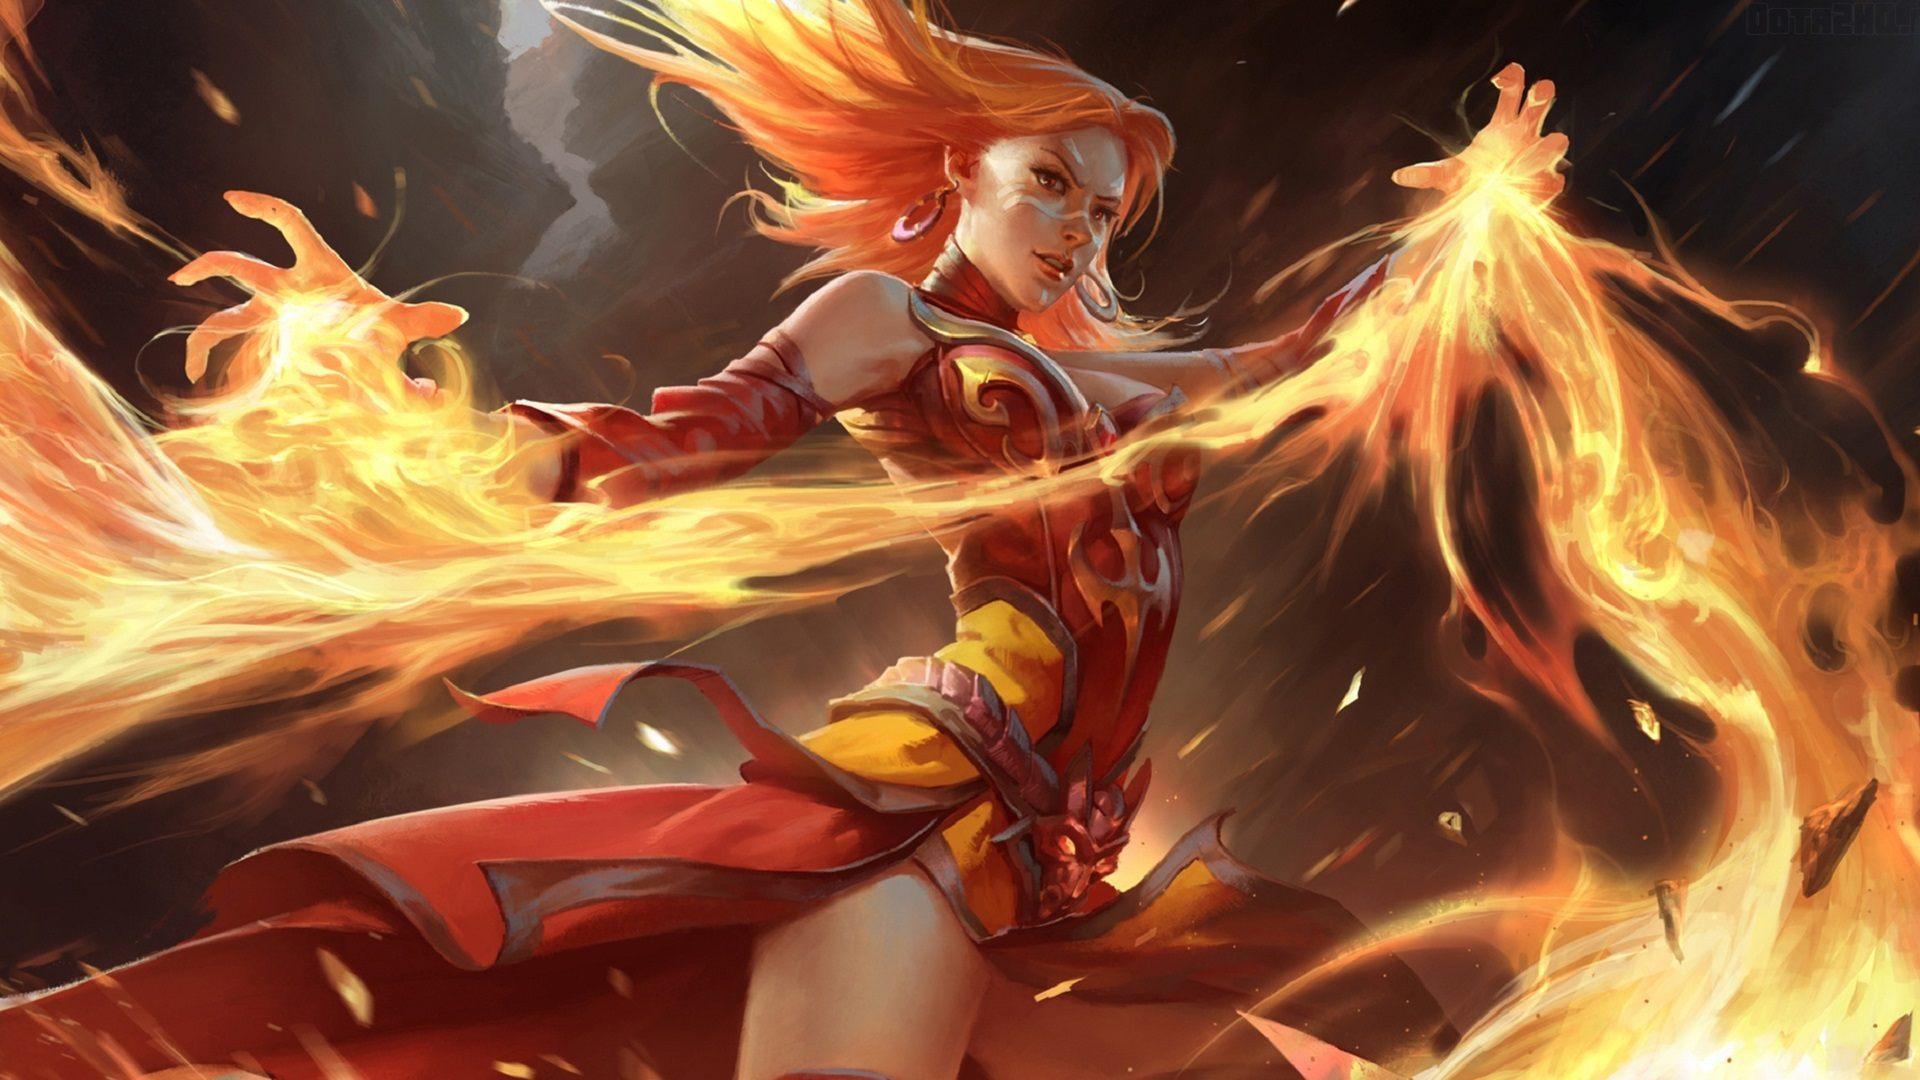 dota 2 lina 3d 2015   Defense of The Ancients Games 1920x1080